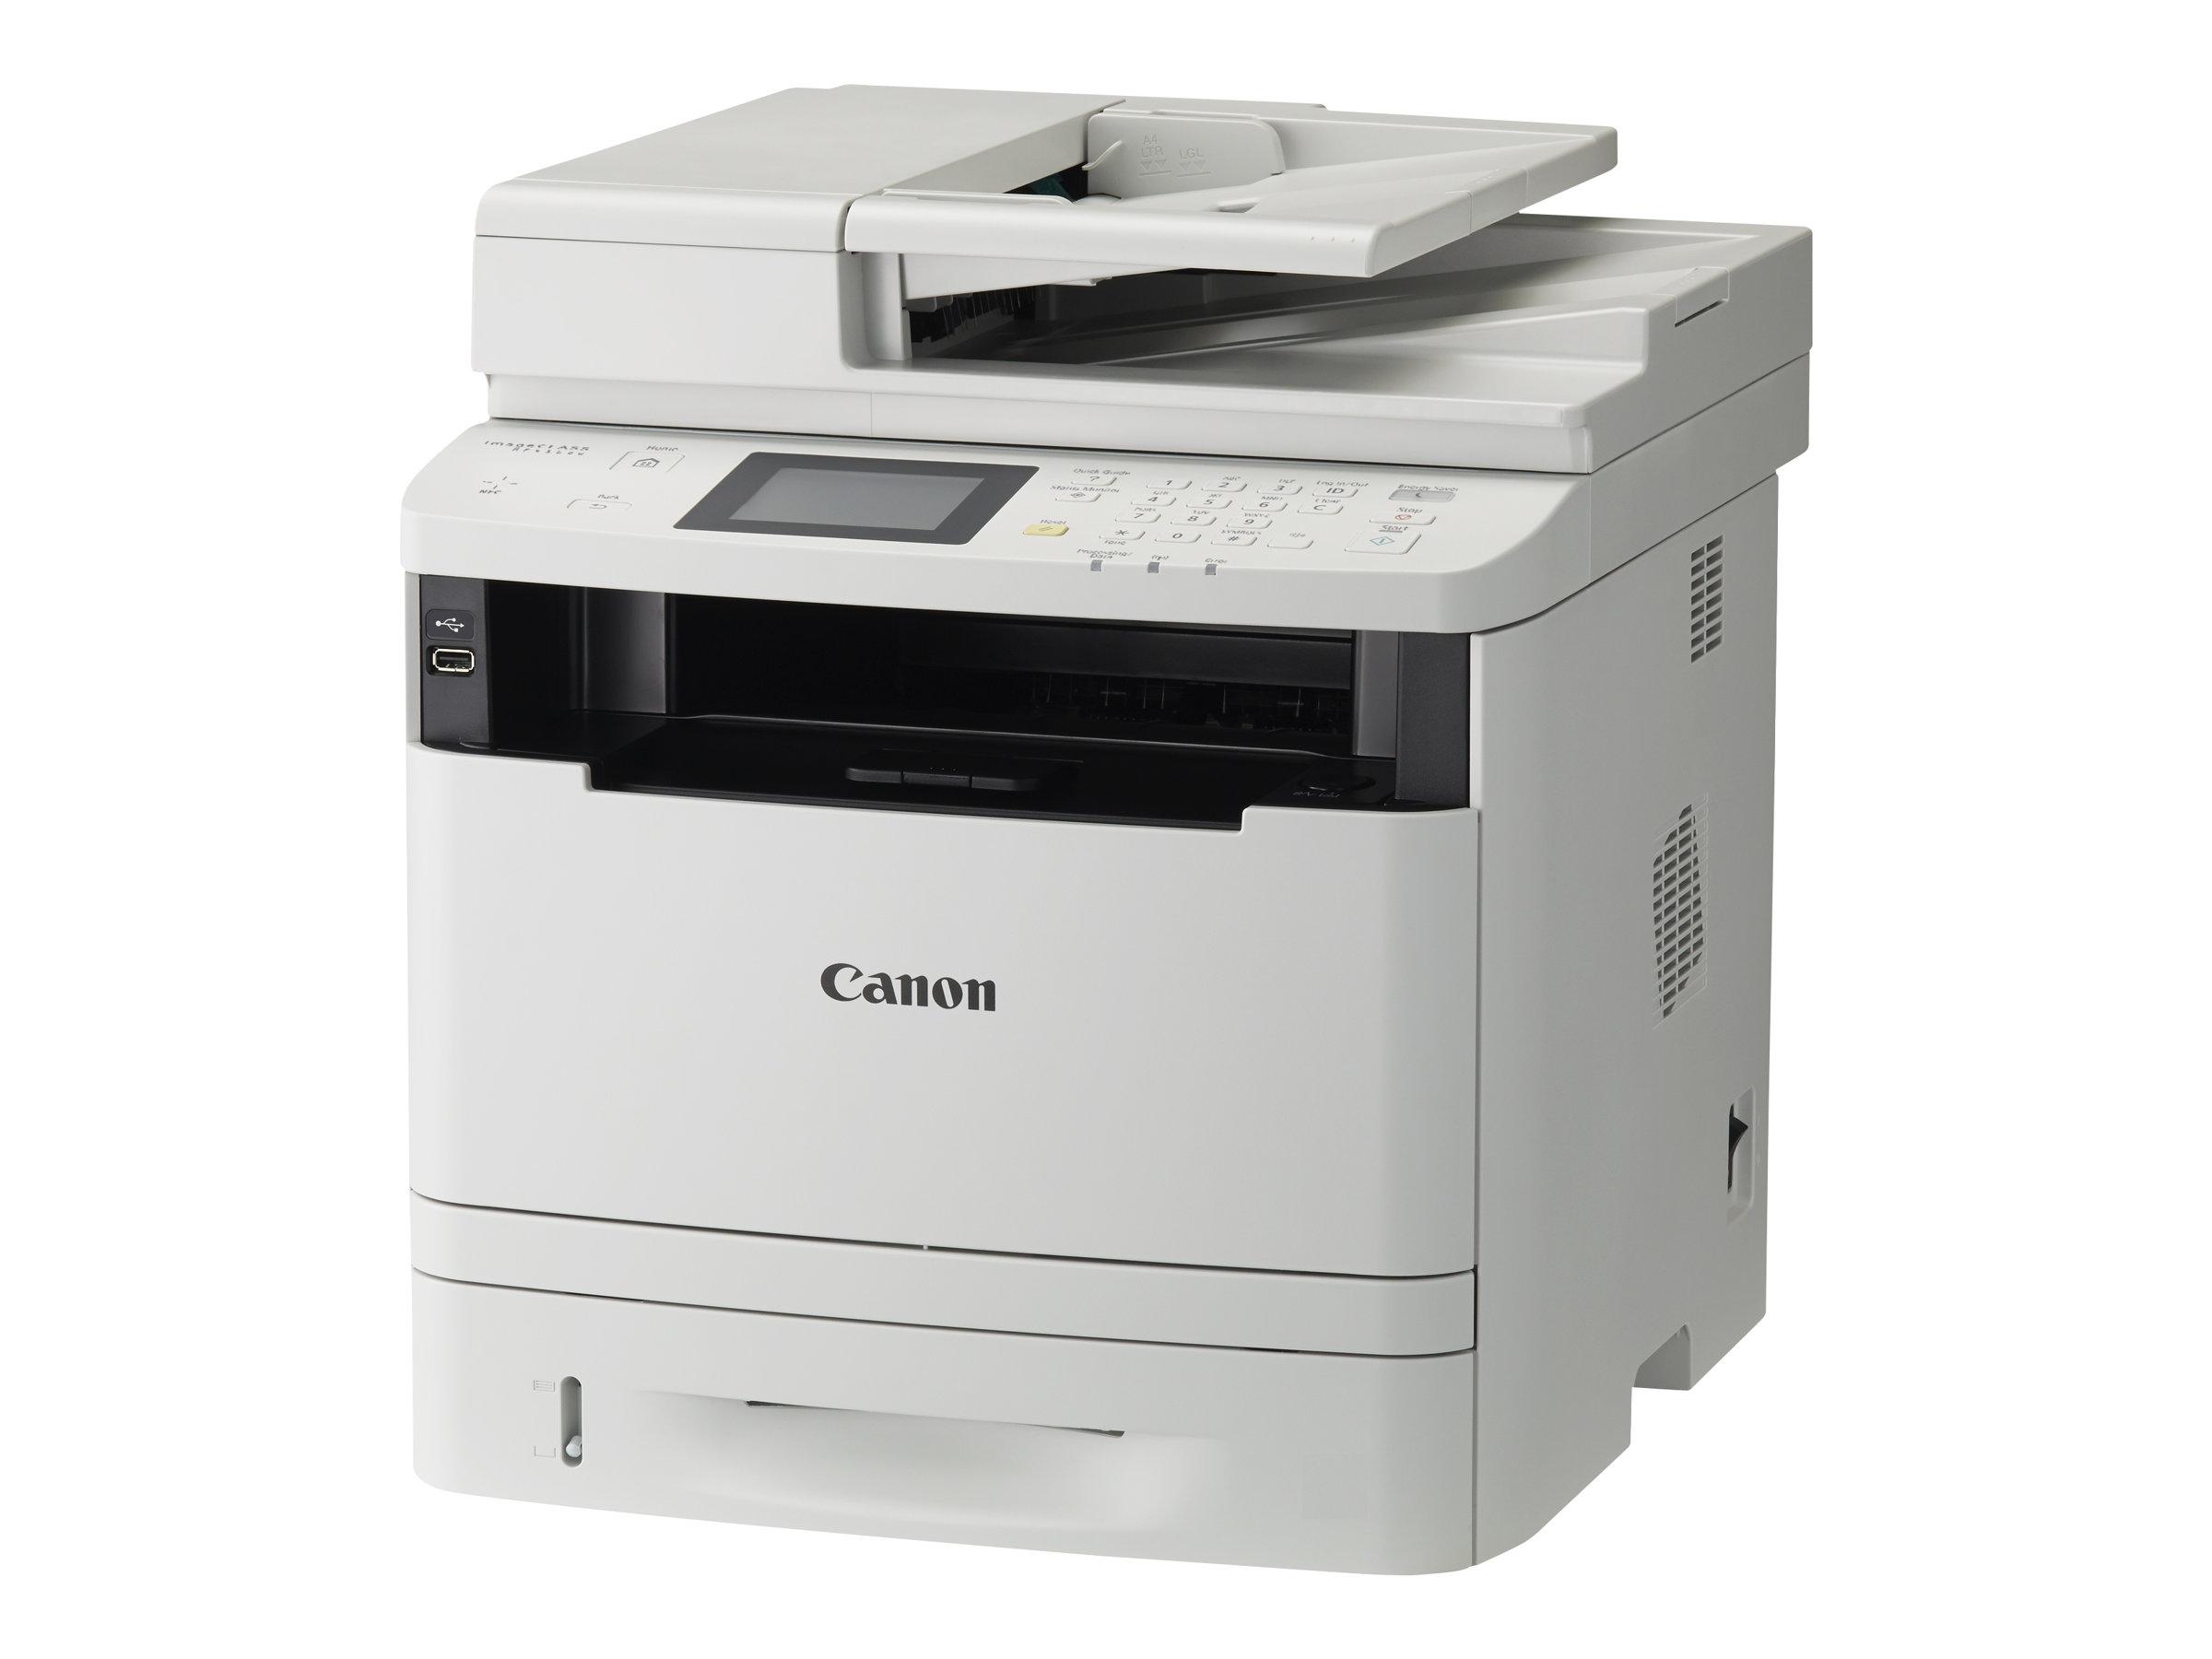 Canon i-SENSYS MF416dw - Multifunktionsdrucker